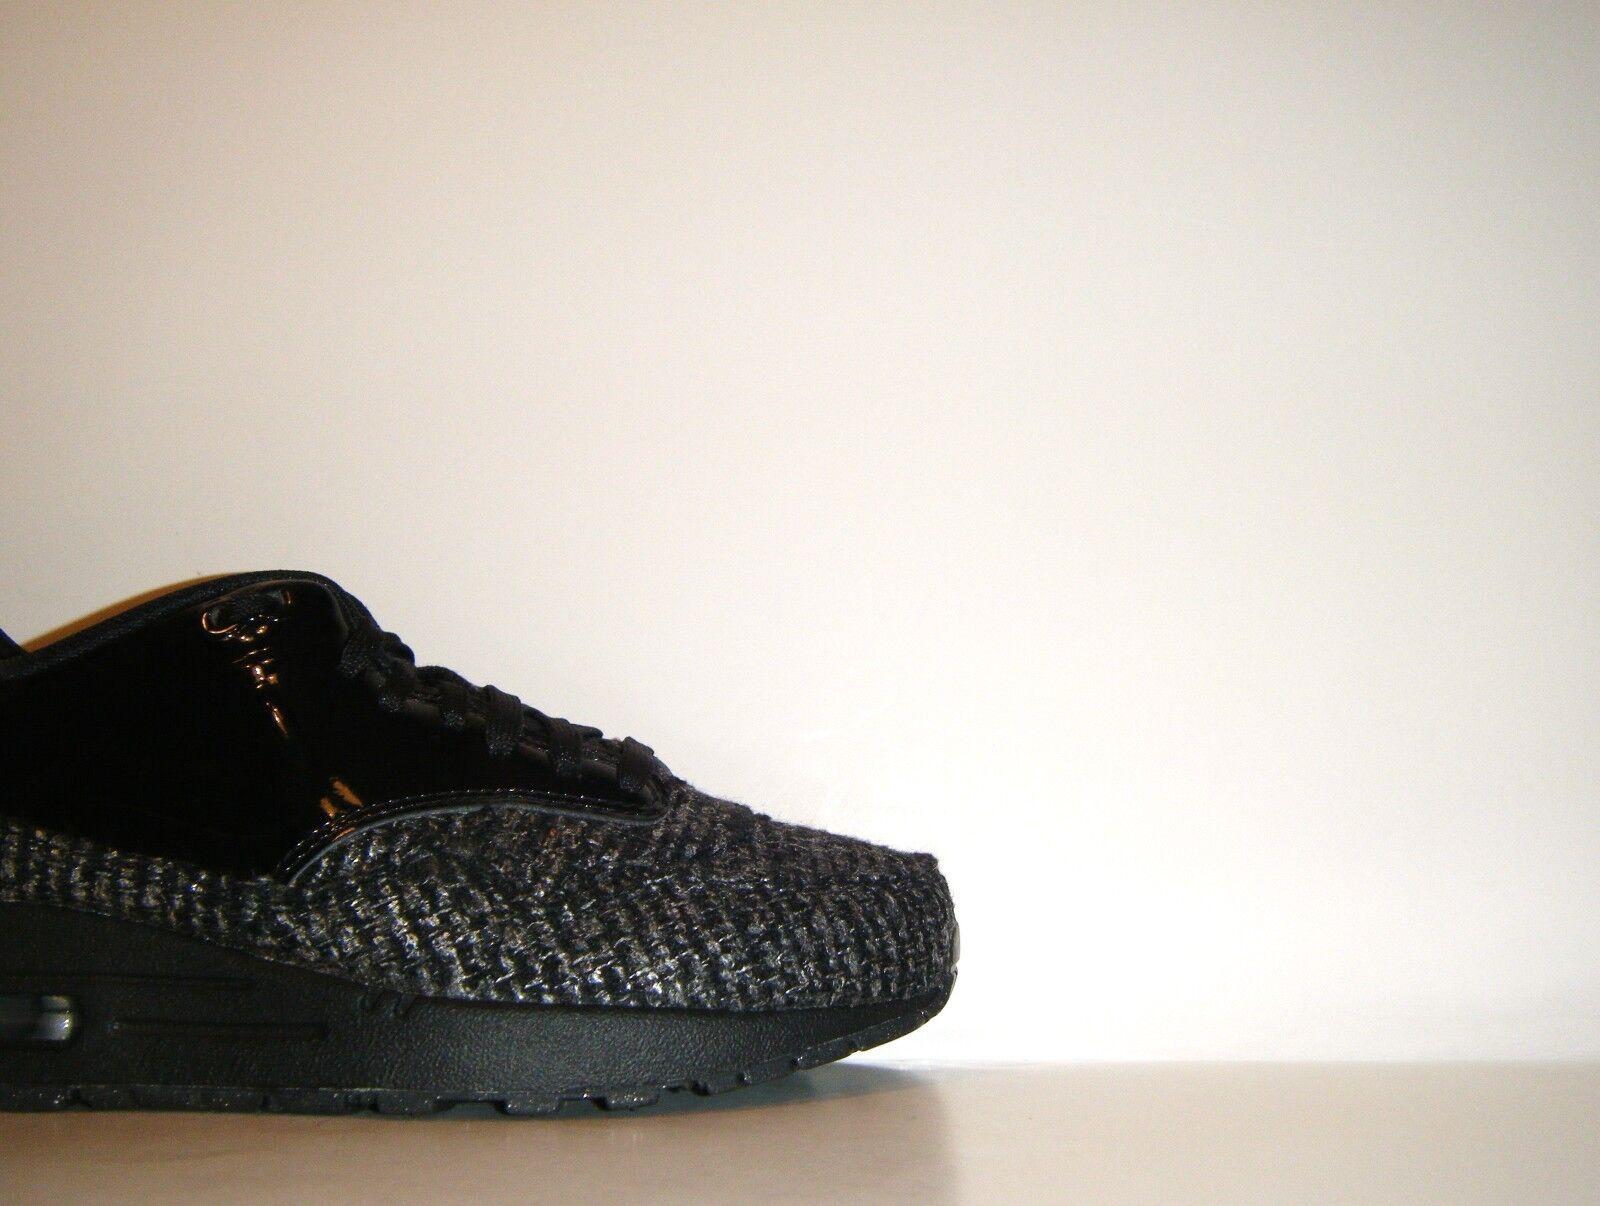 Nike air force 1 07 og triplo white whiteout classico scarpe af1 donne sono 11 le scarpe